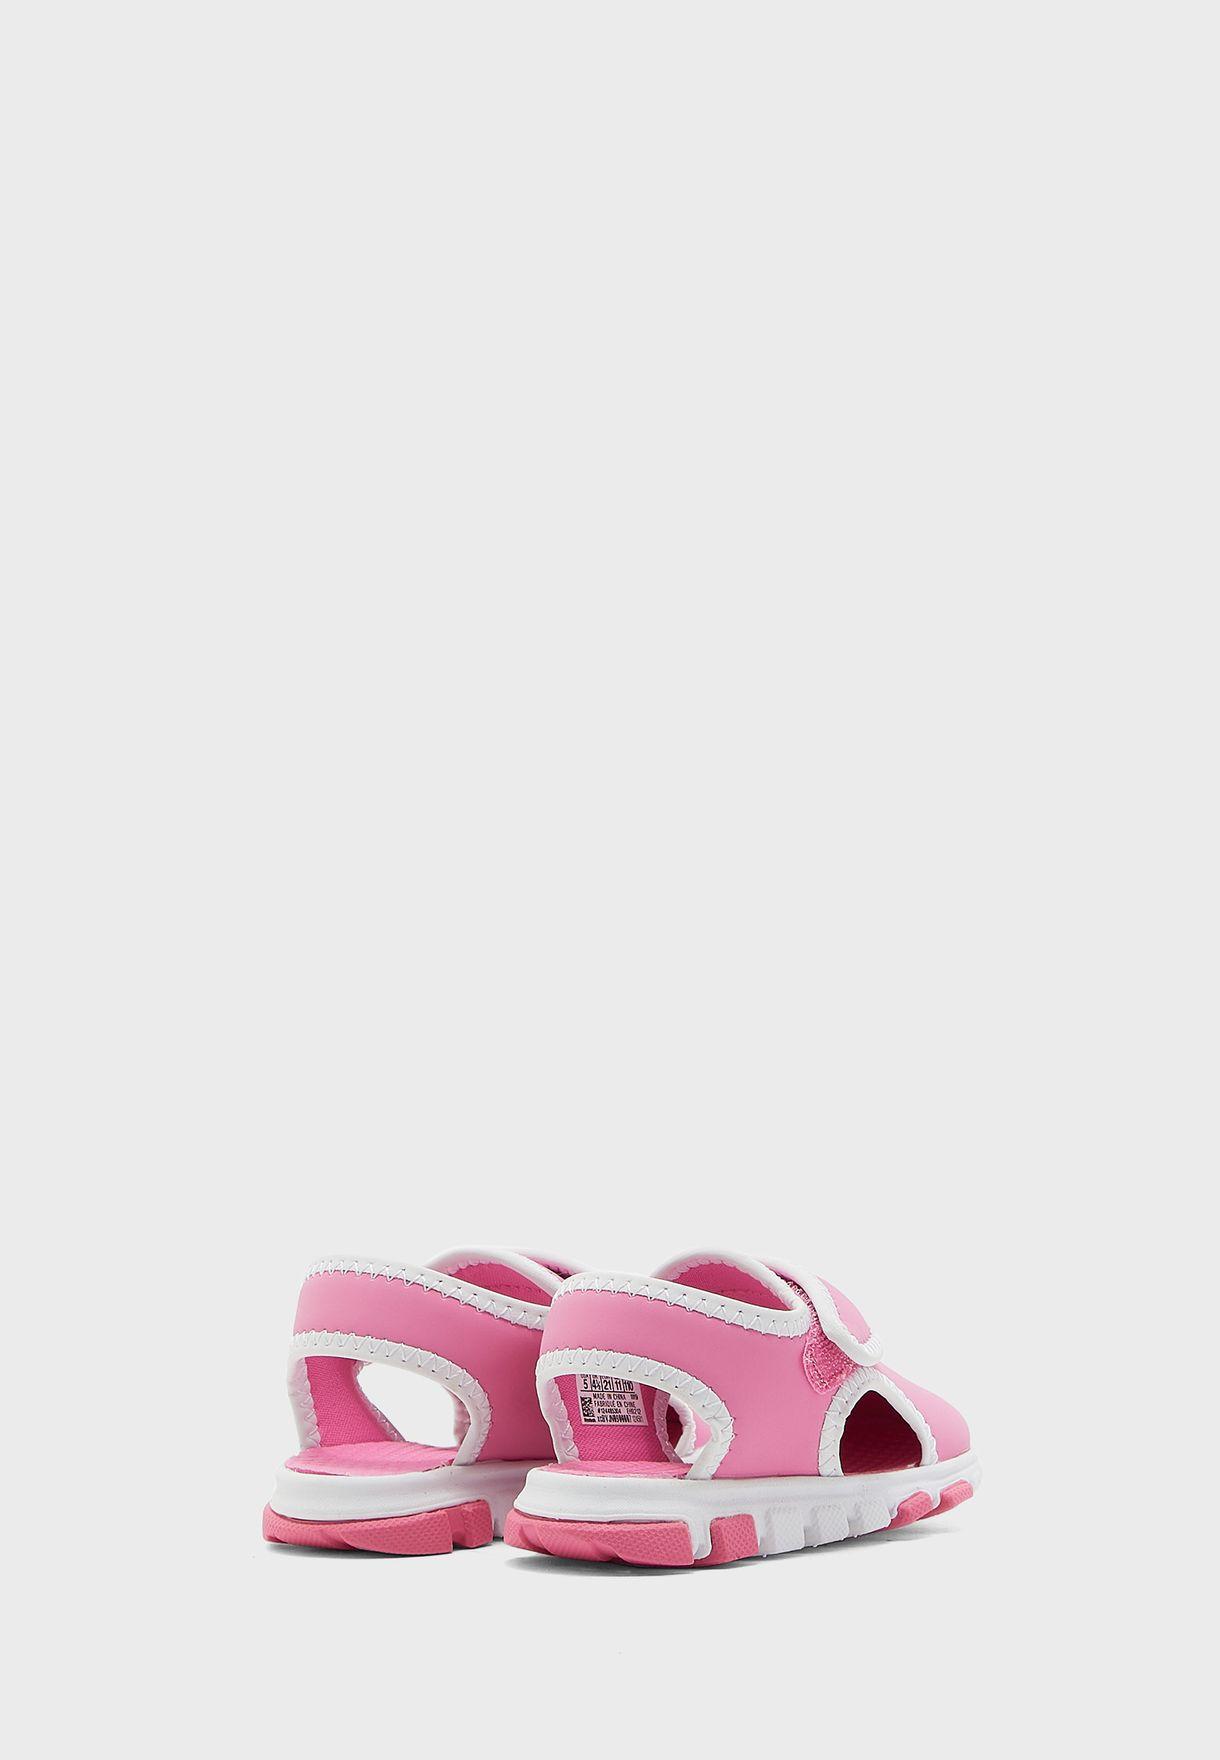 حذاء ويف جلايدر III